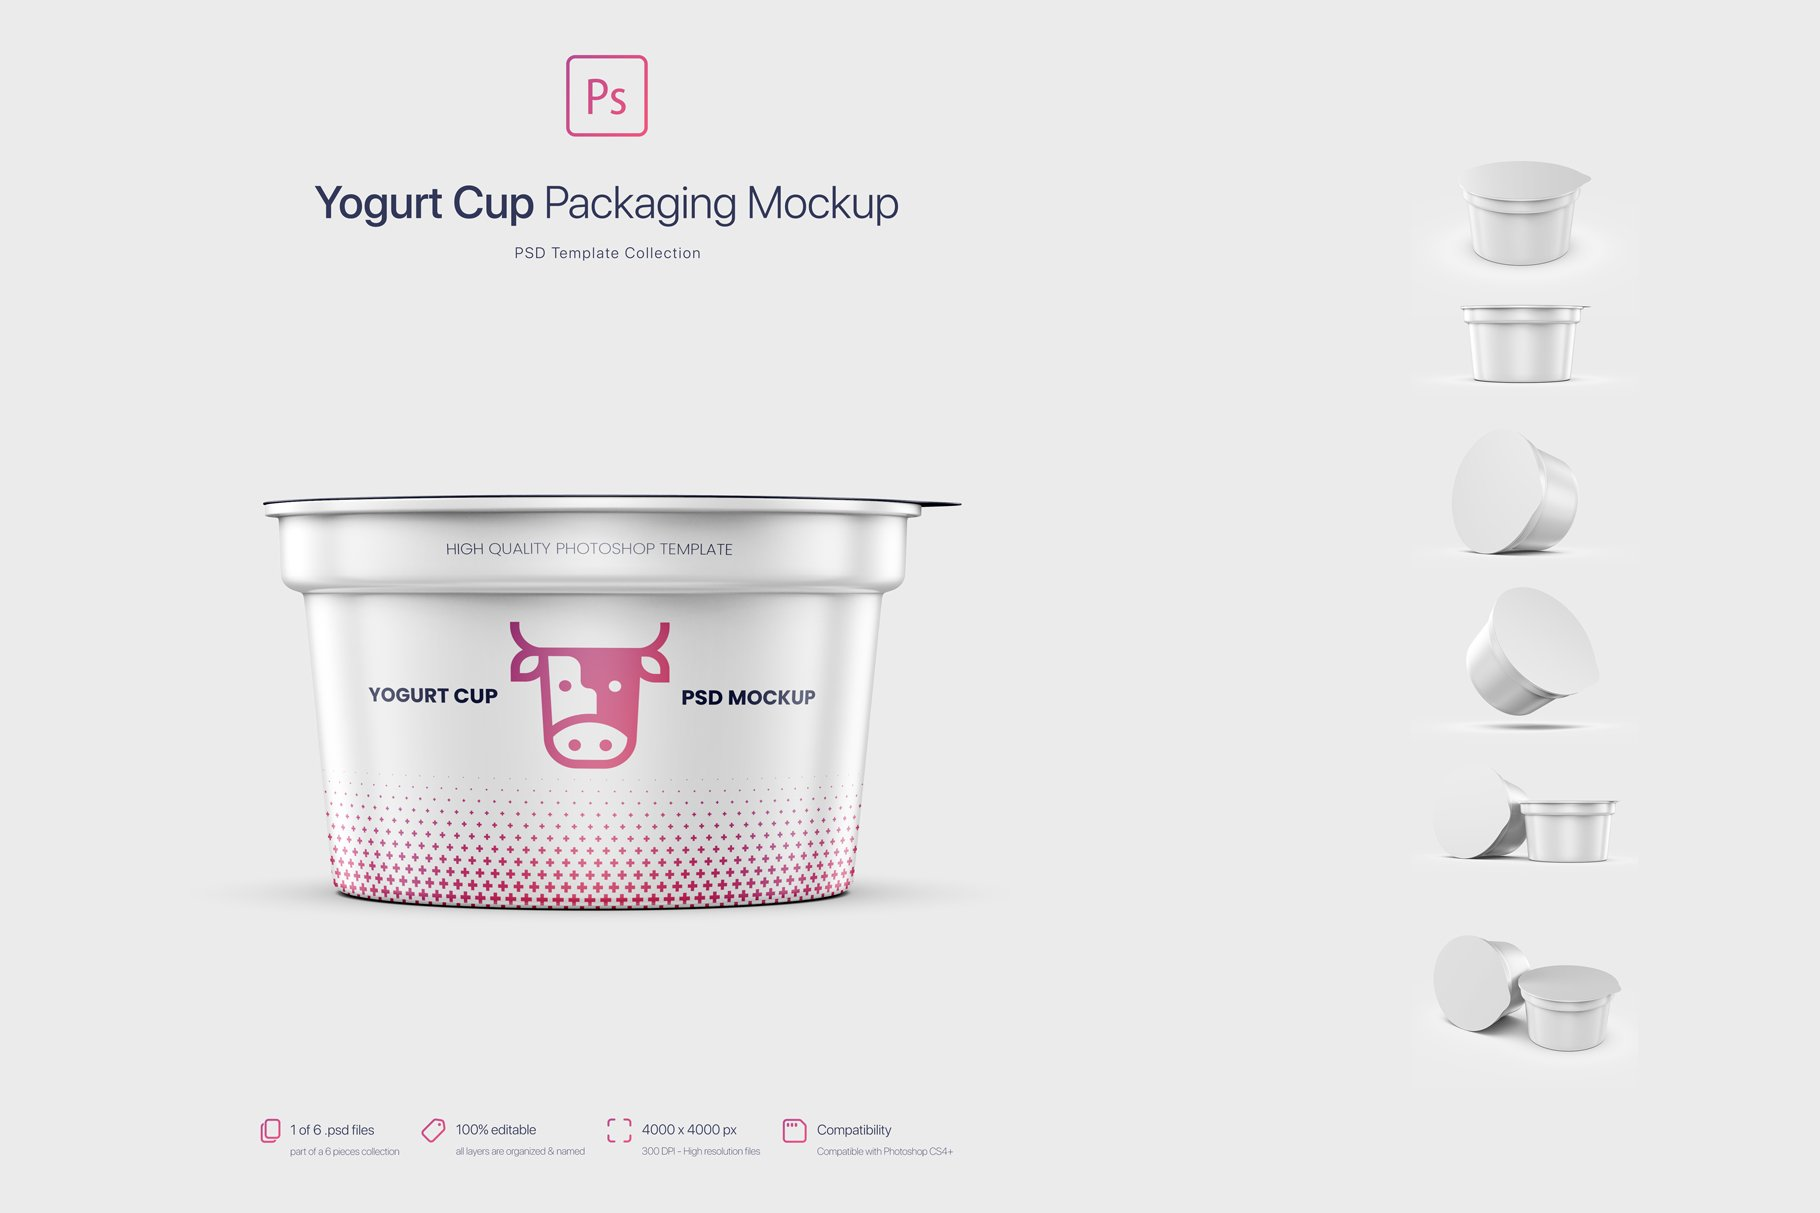 6款逼真高质量酸奶杯设计展示样机 Yogurt Cup Packaging Mockup插图5